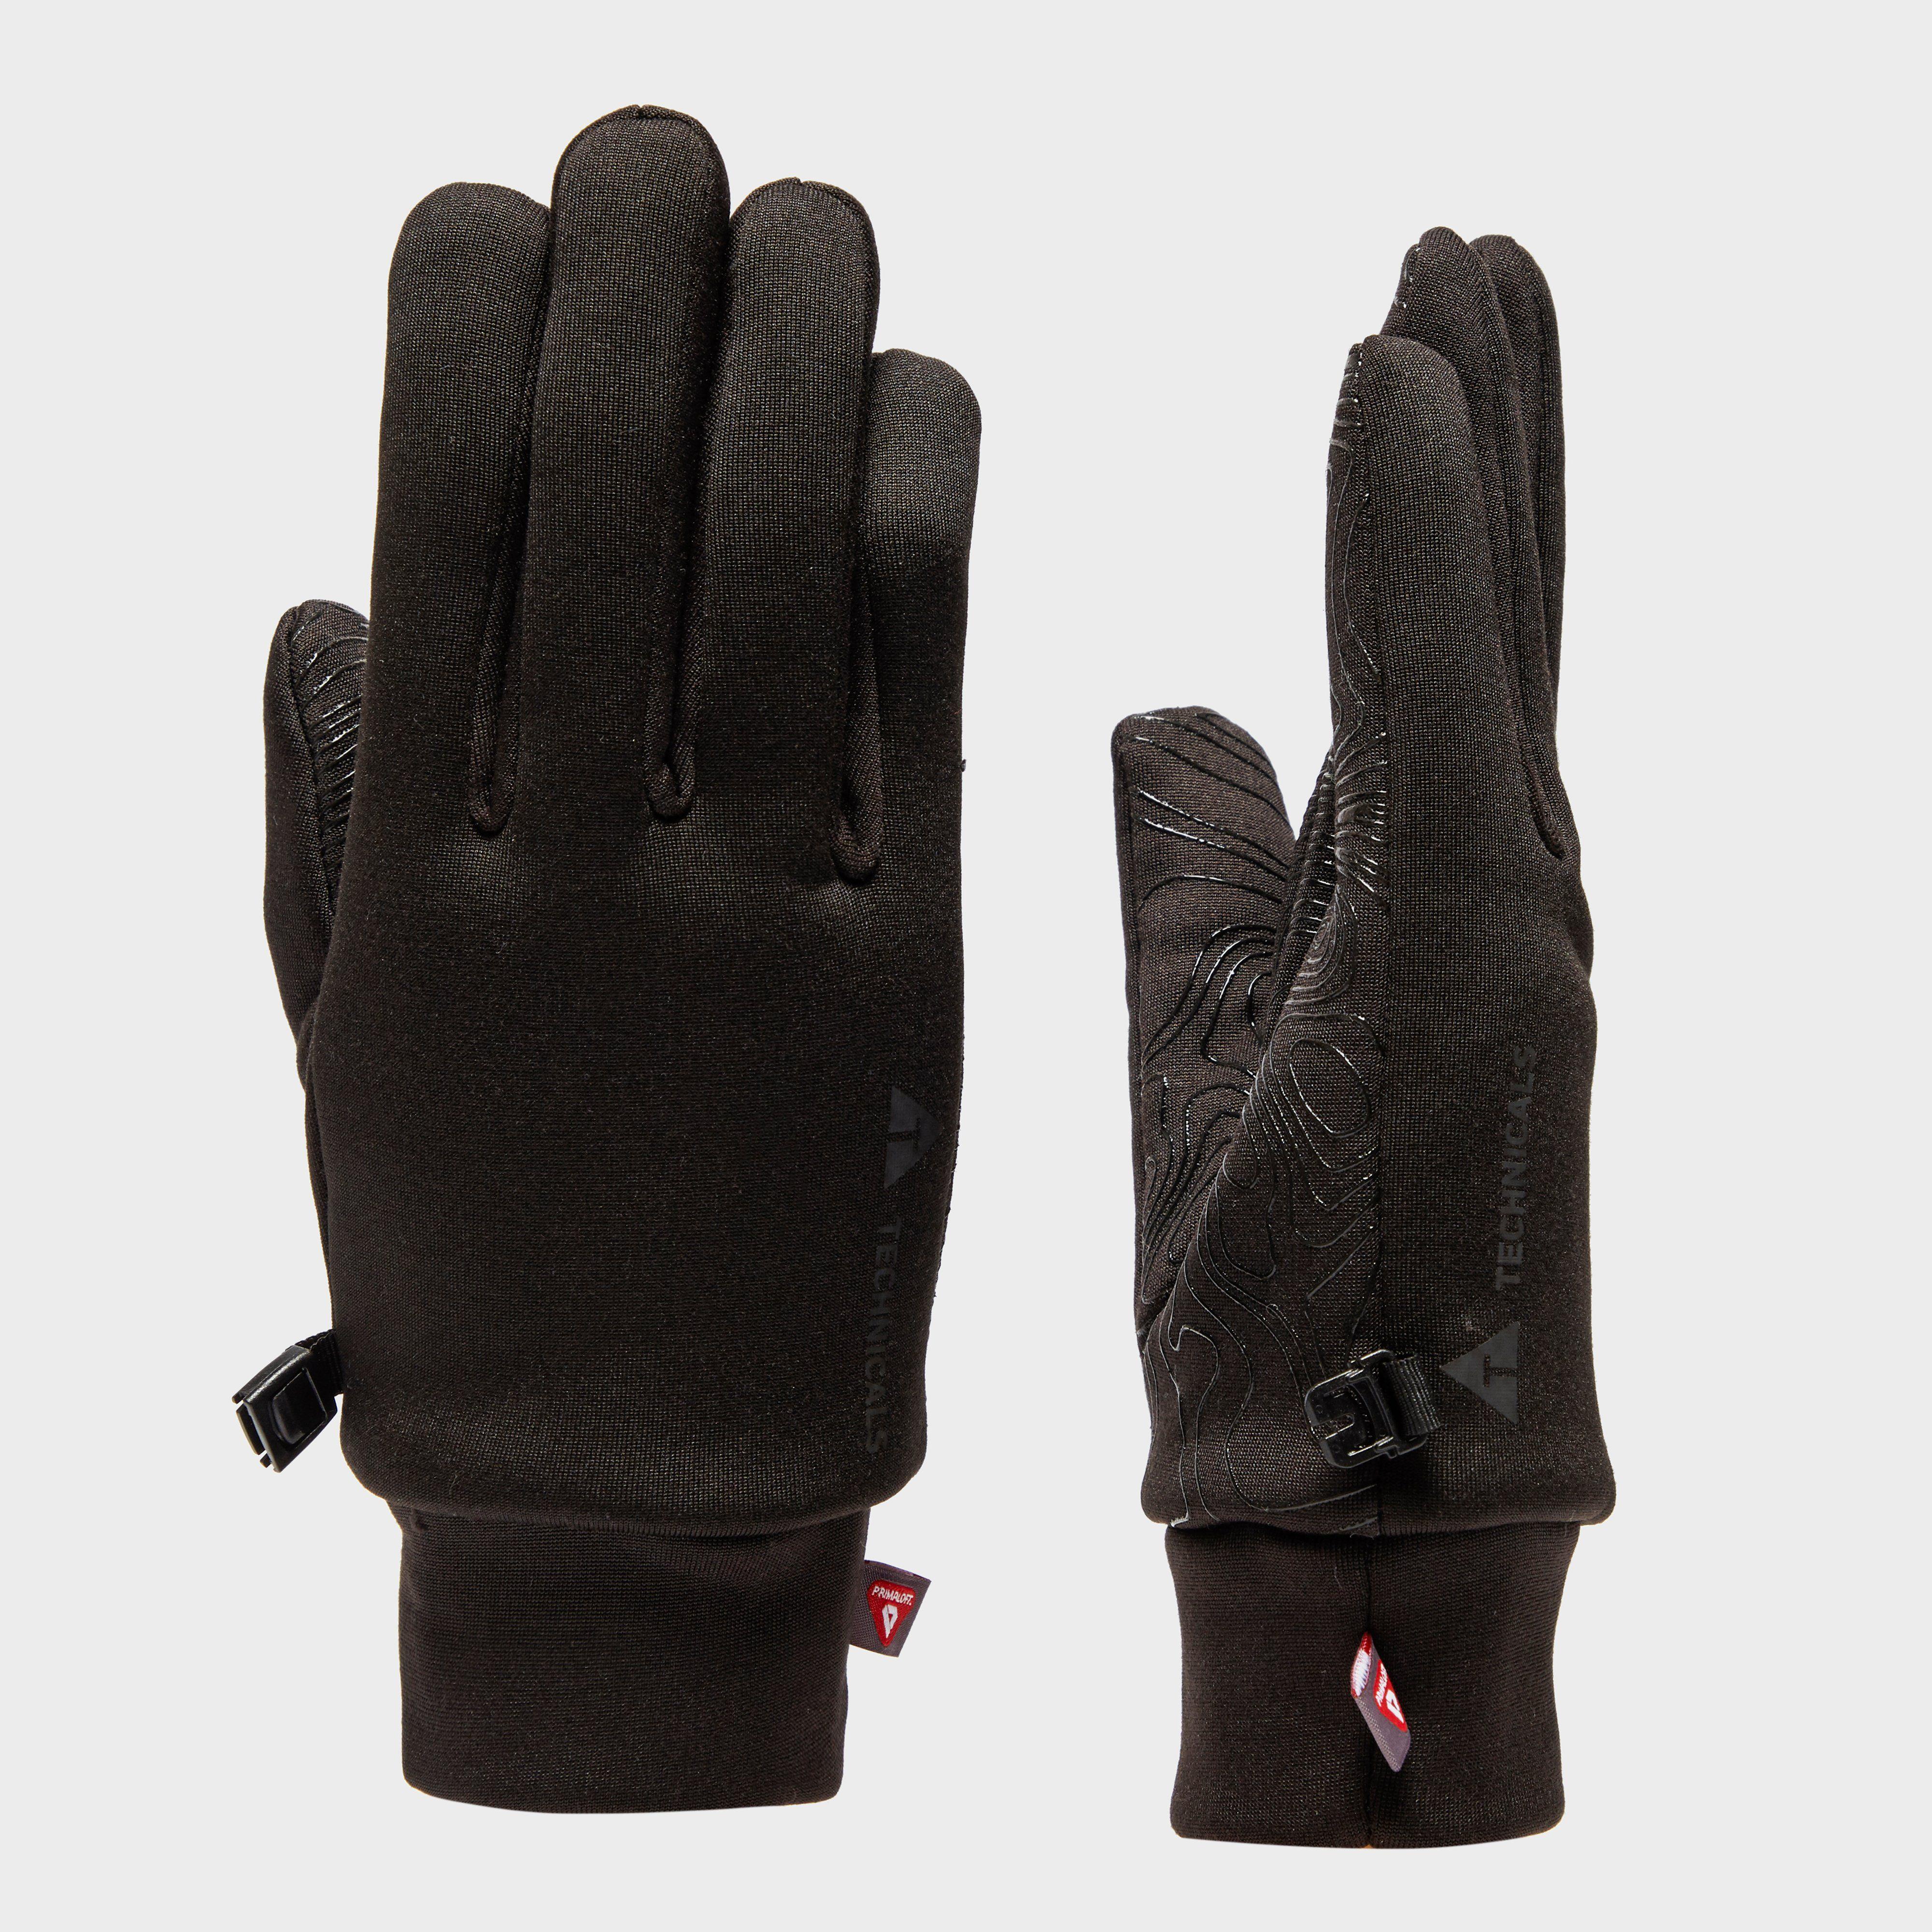 TECHNICALS Women's Gripper Gloves